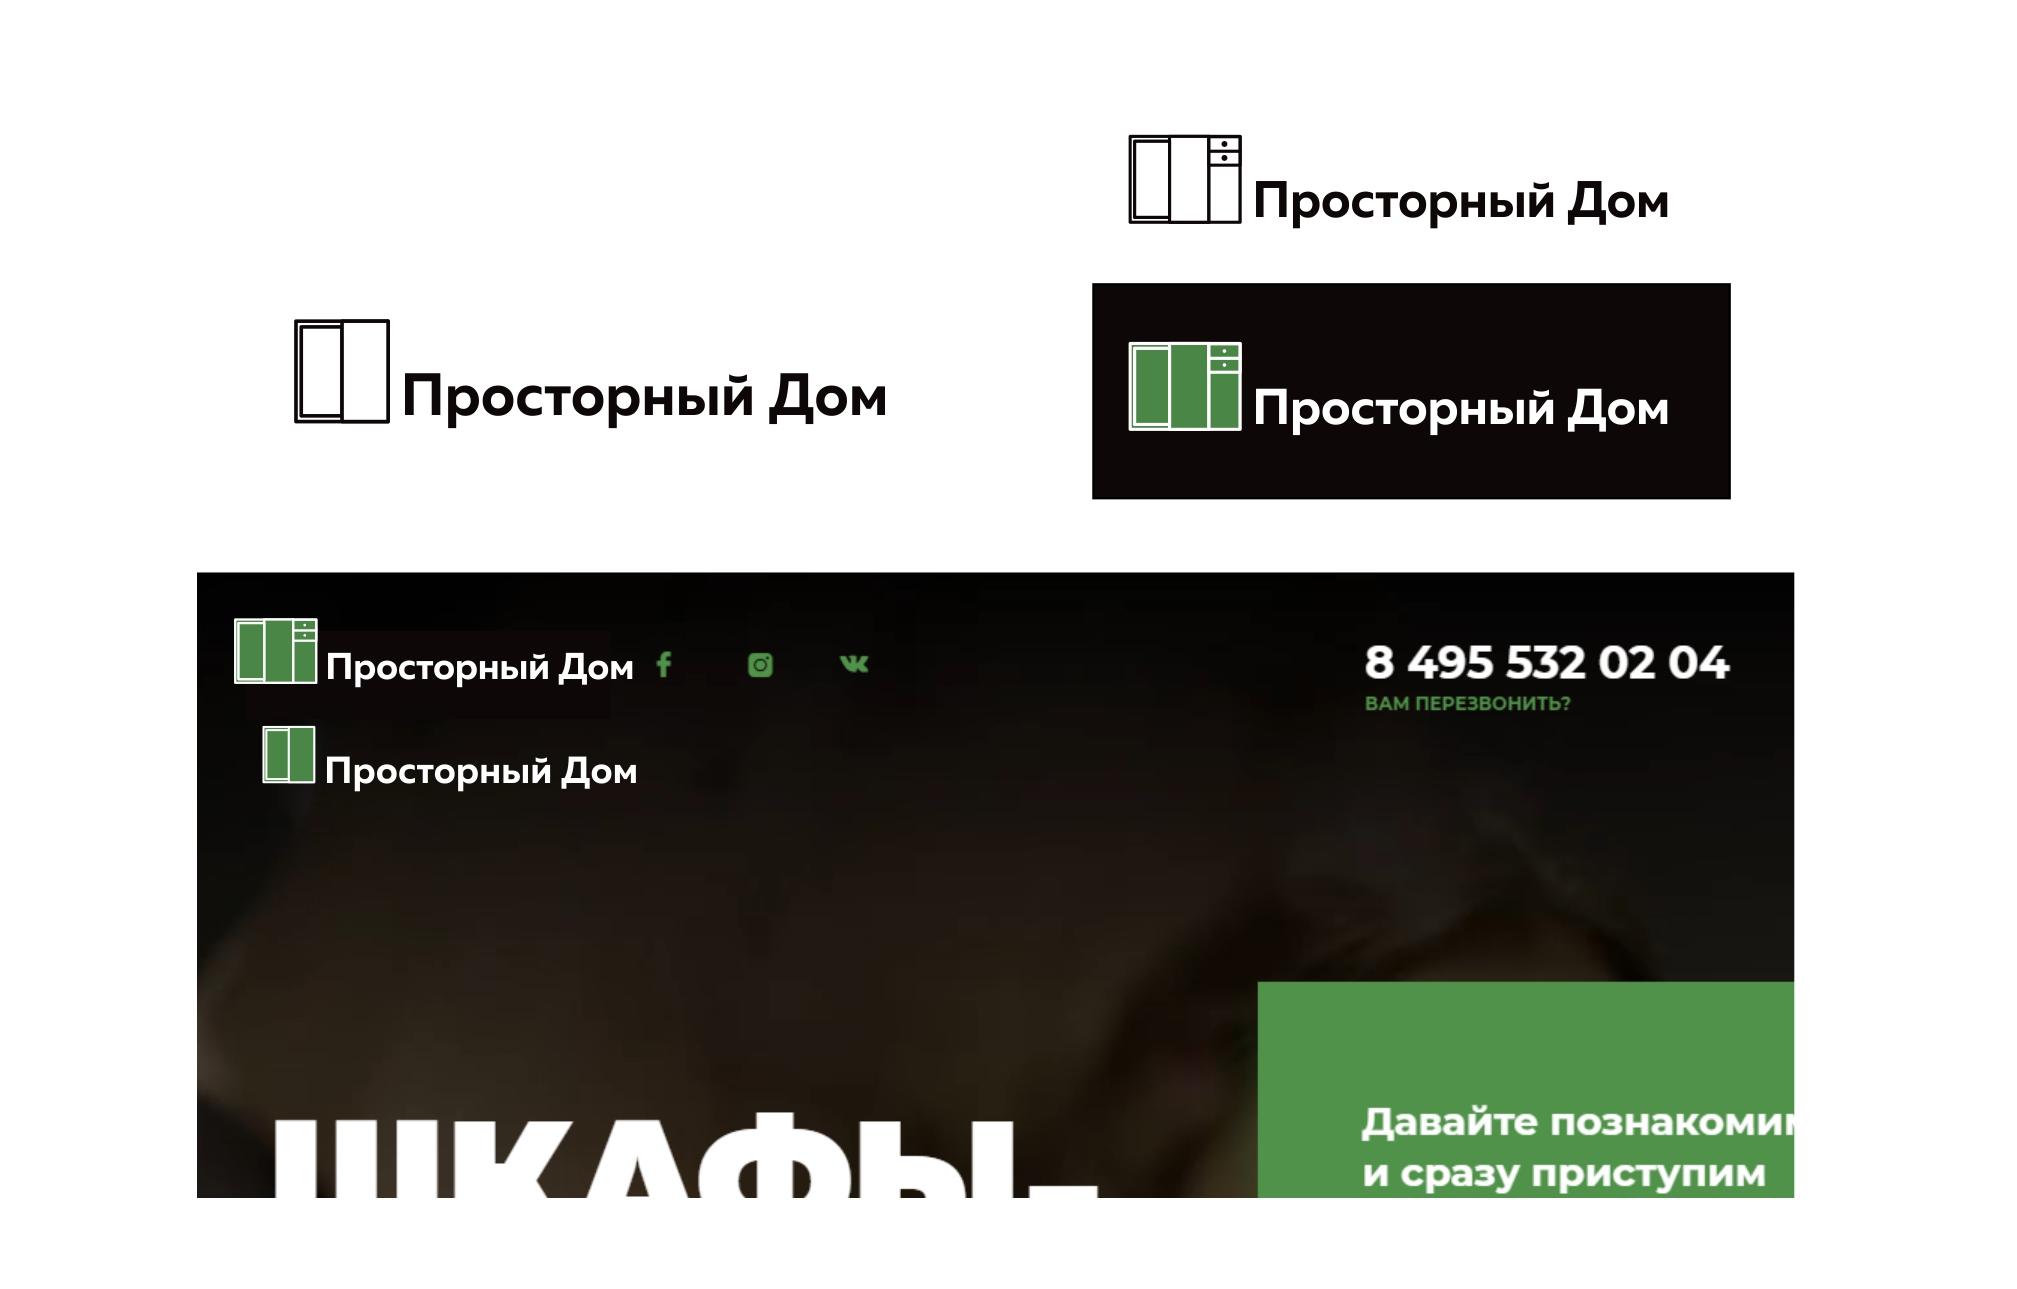 Логотип и фирменный стиль для компании по шкафам-купе фото f_3125b6b07c50b788.jpg